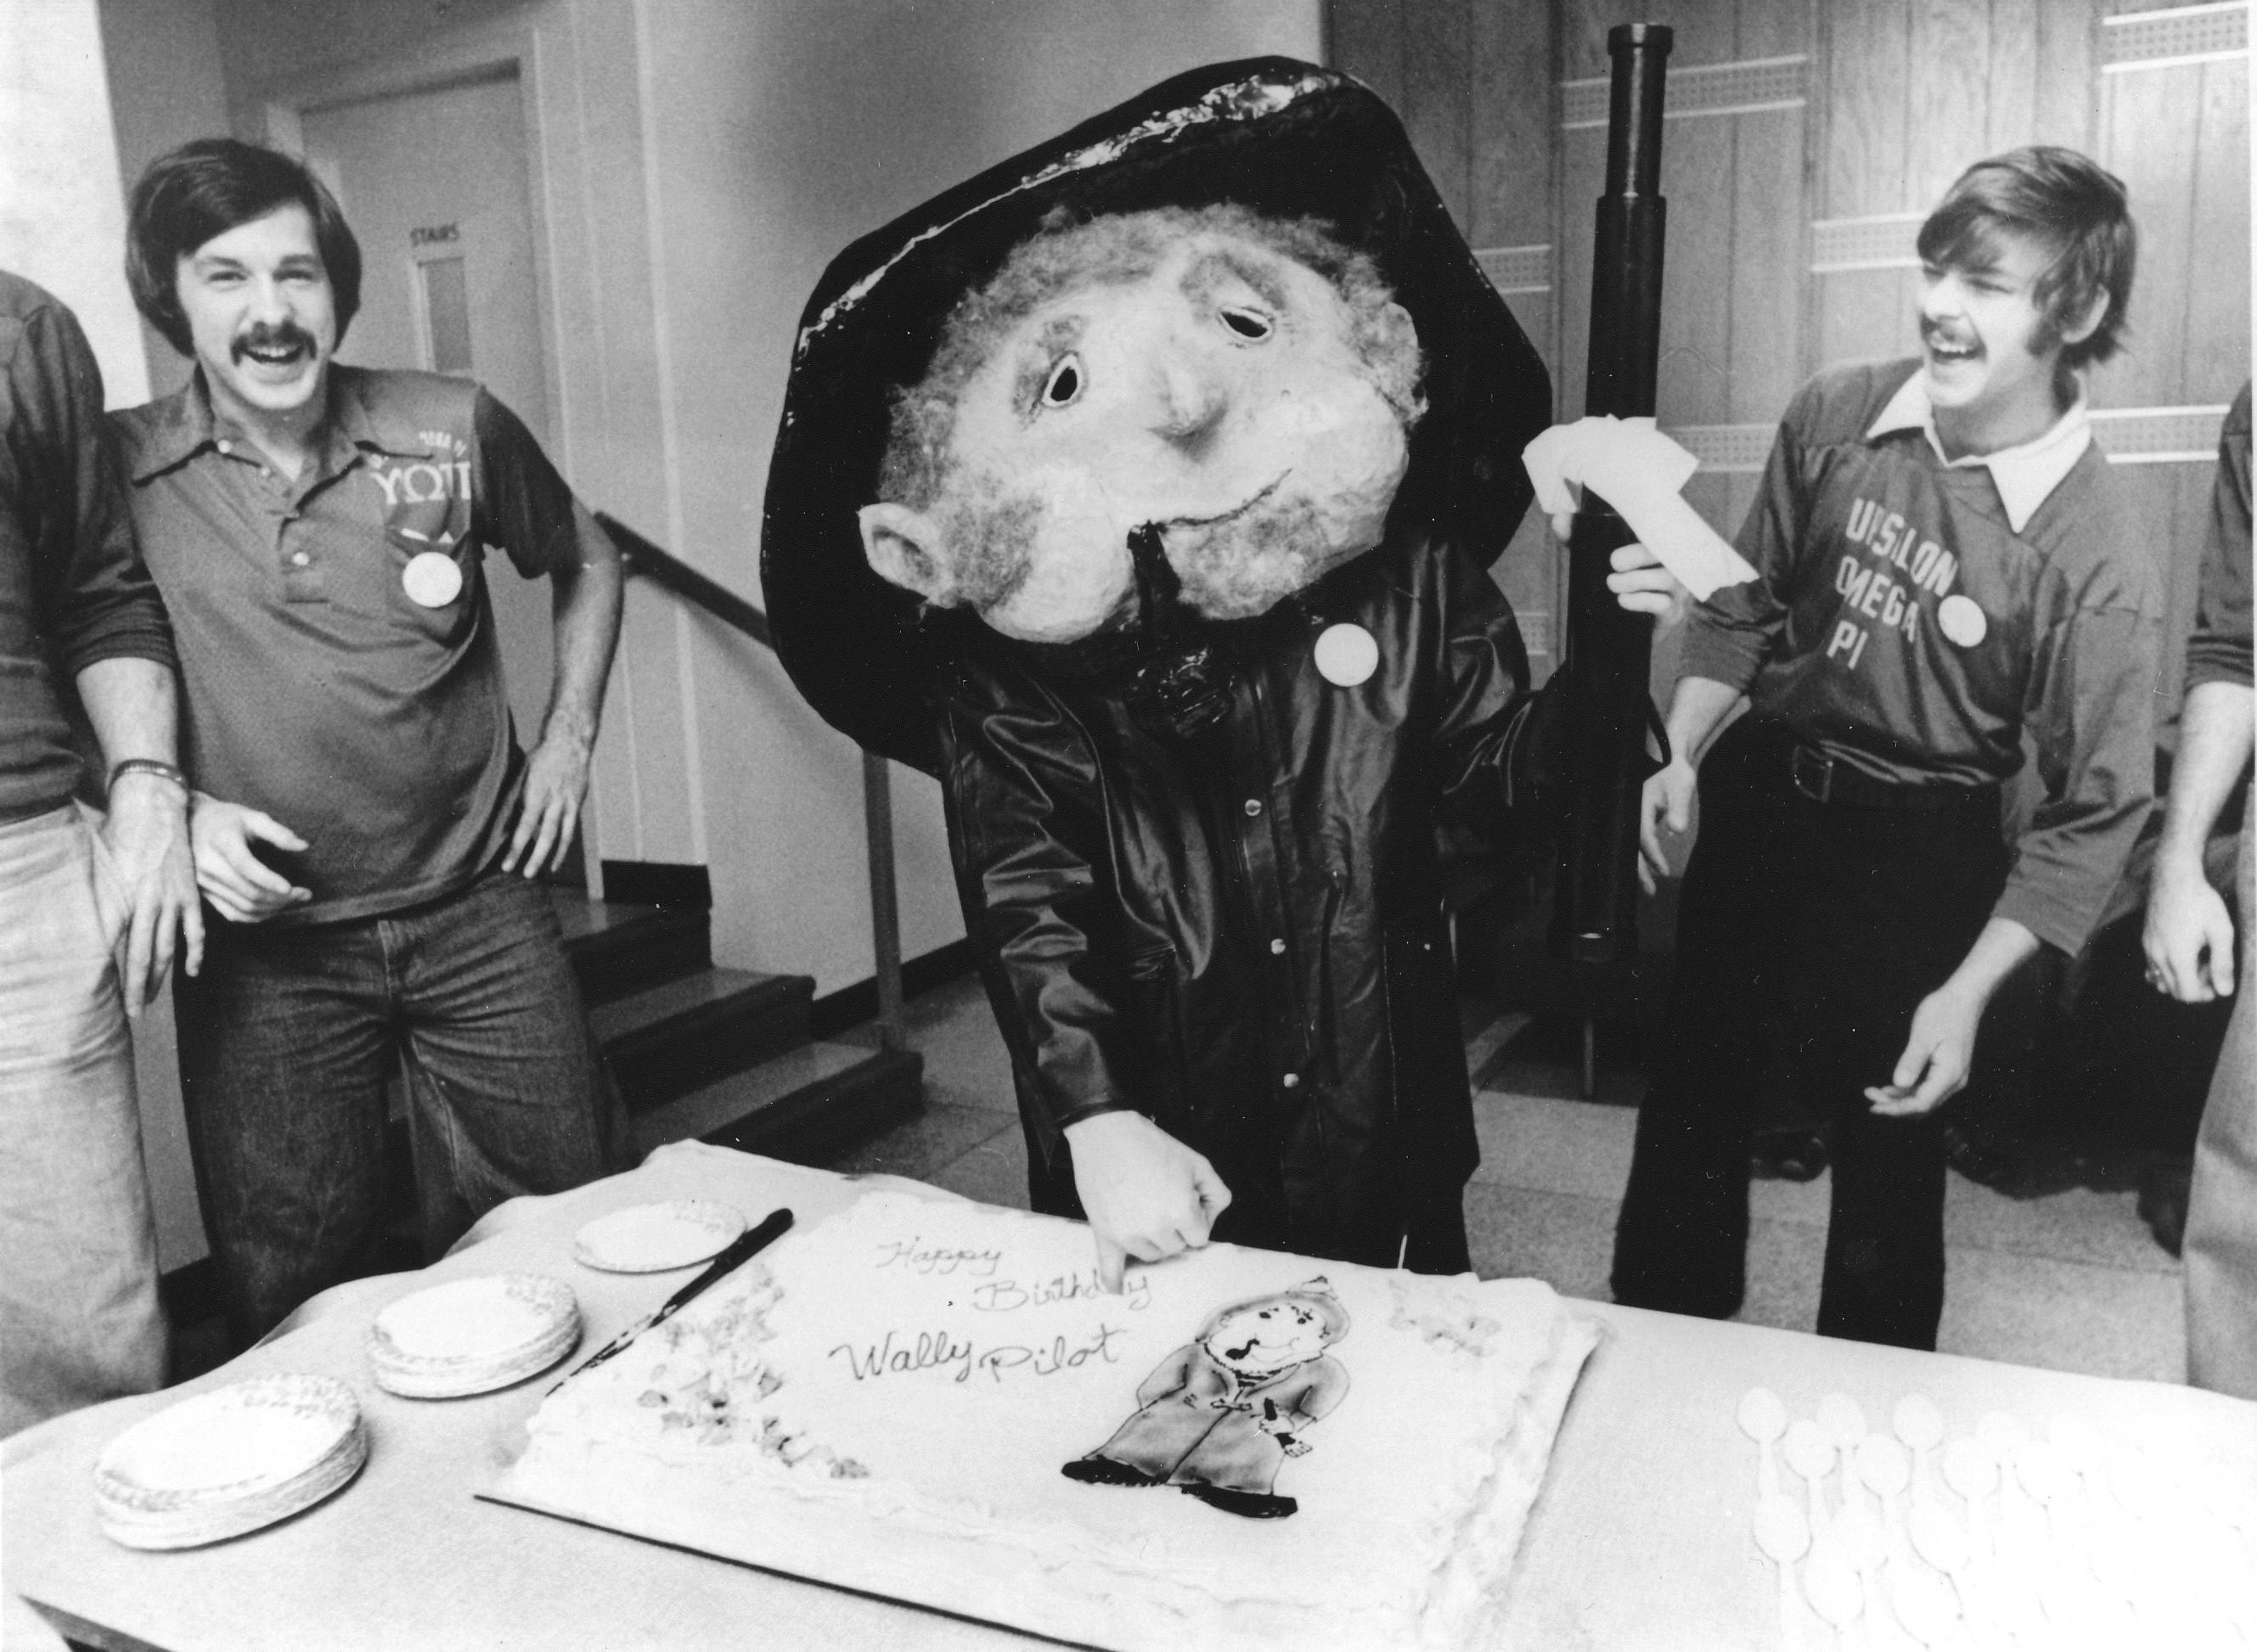 Wally Pilot 30th birthday, 1978